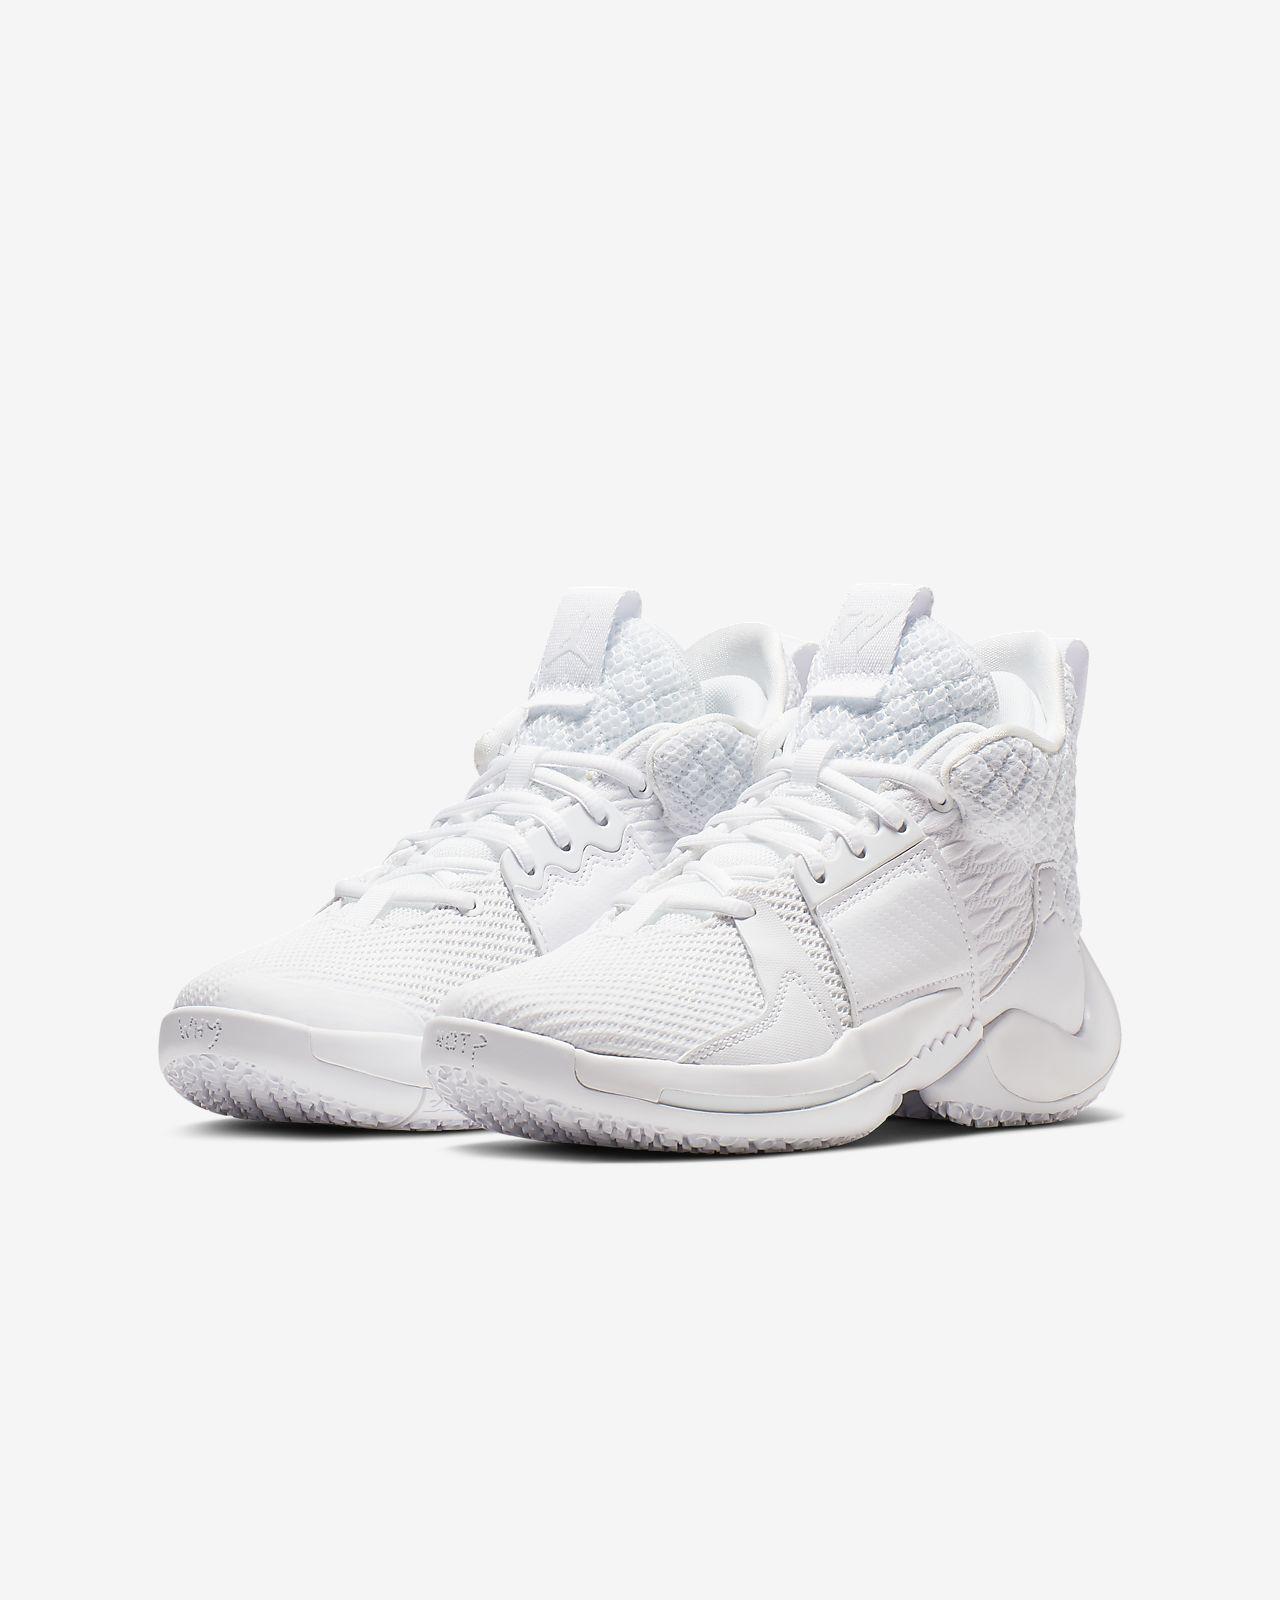 hot sale online 8ecce b2361 Jordan